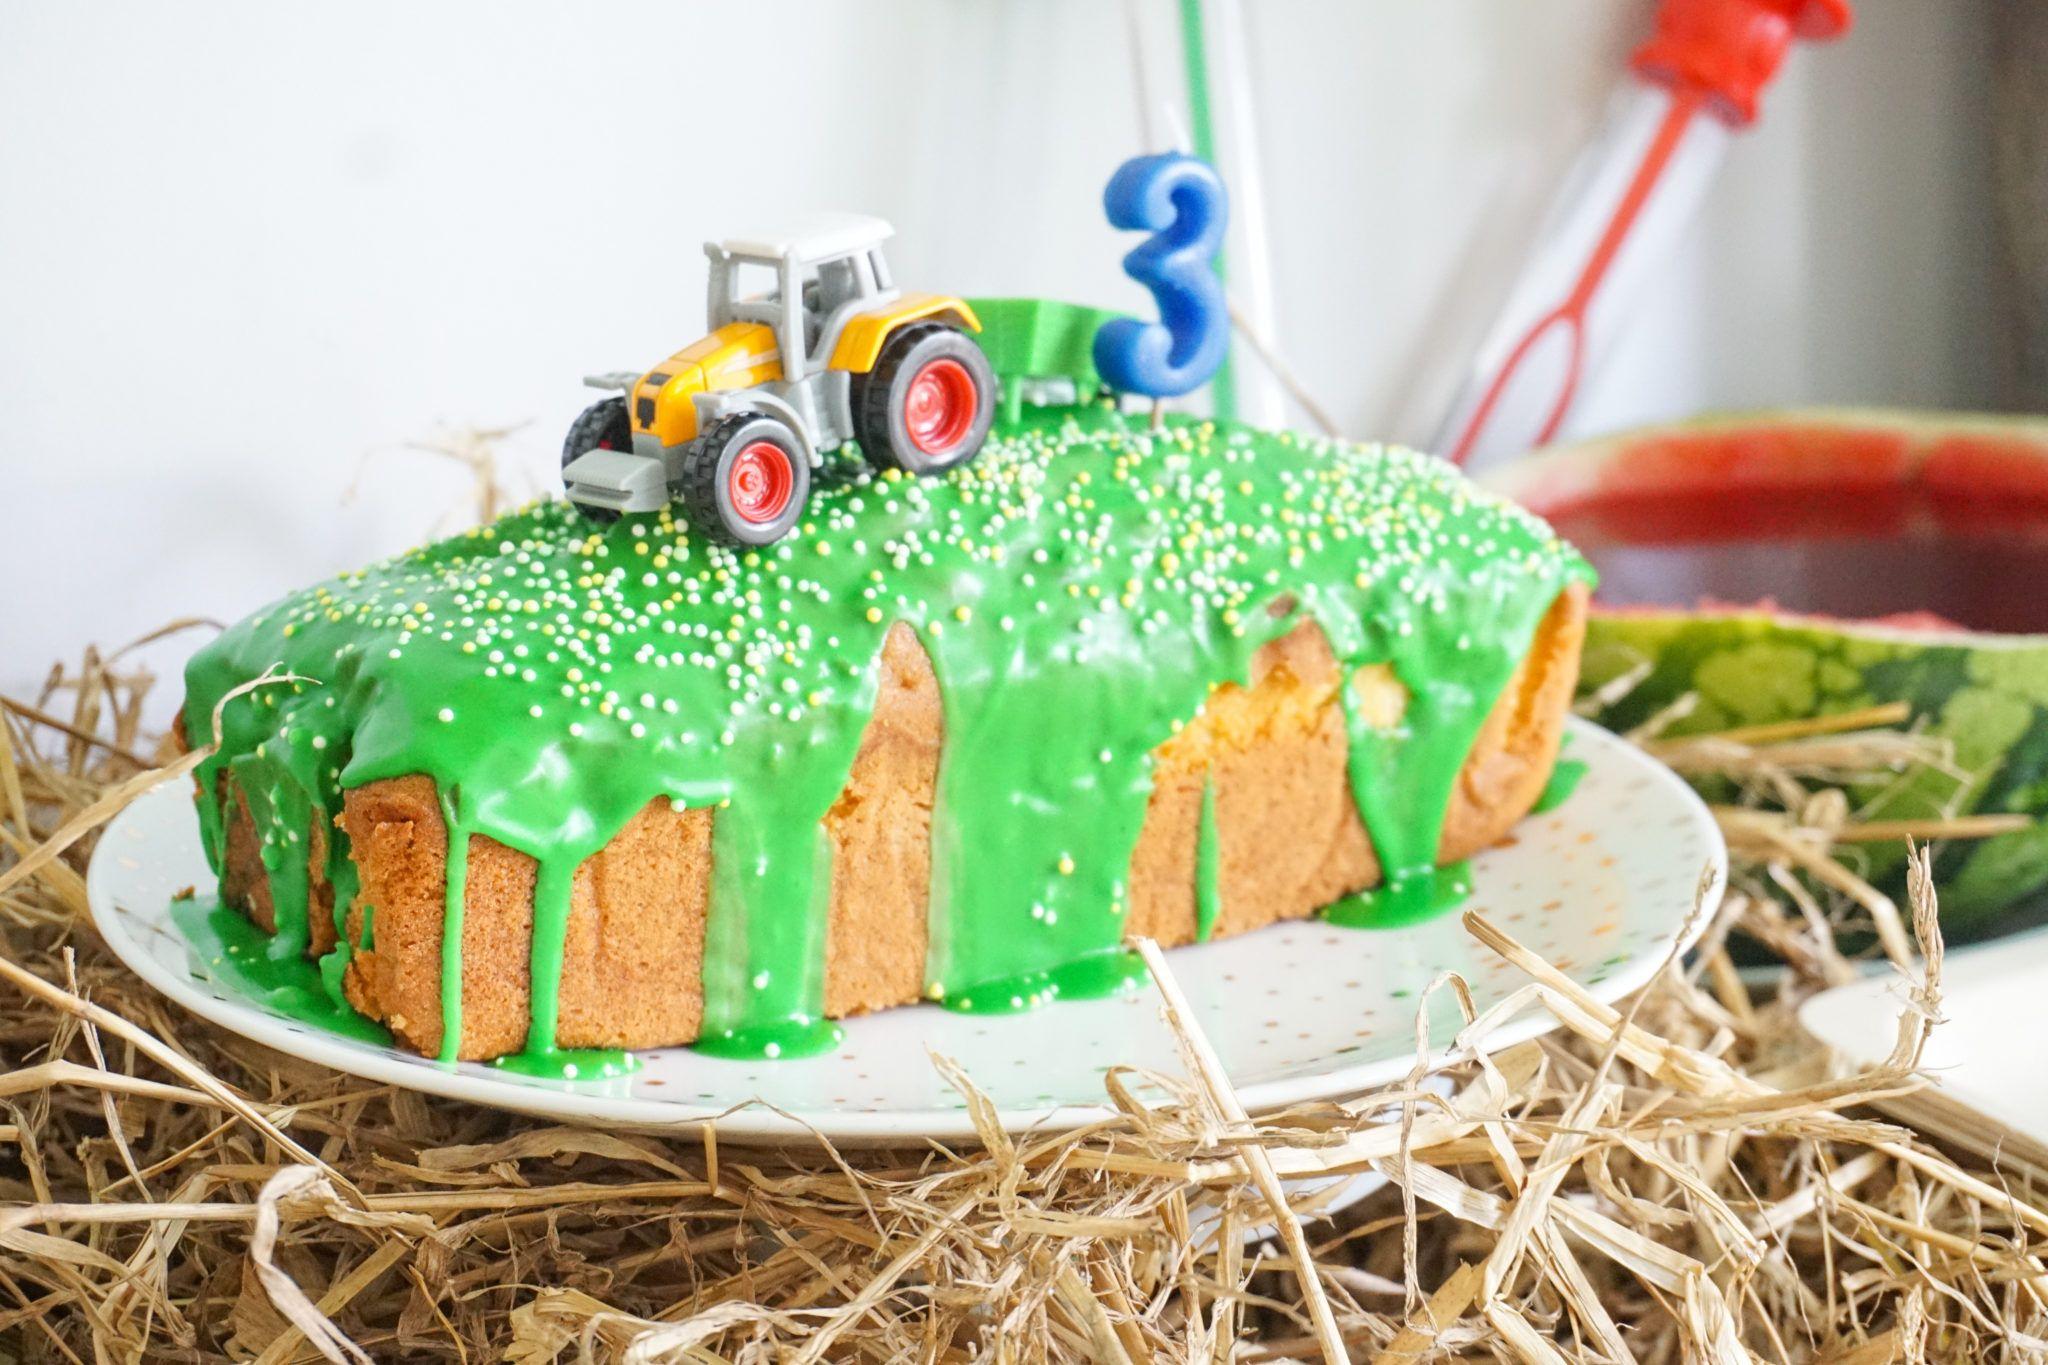 Traktor Geburtstag Einladung Torte Deko Deko Hus Kinder Geburtstag Torte Traktor Geburtstag Kuchen Kindergeburtstag